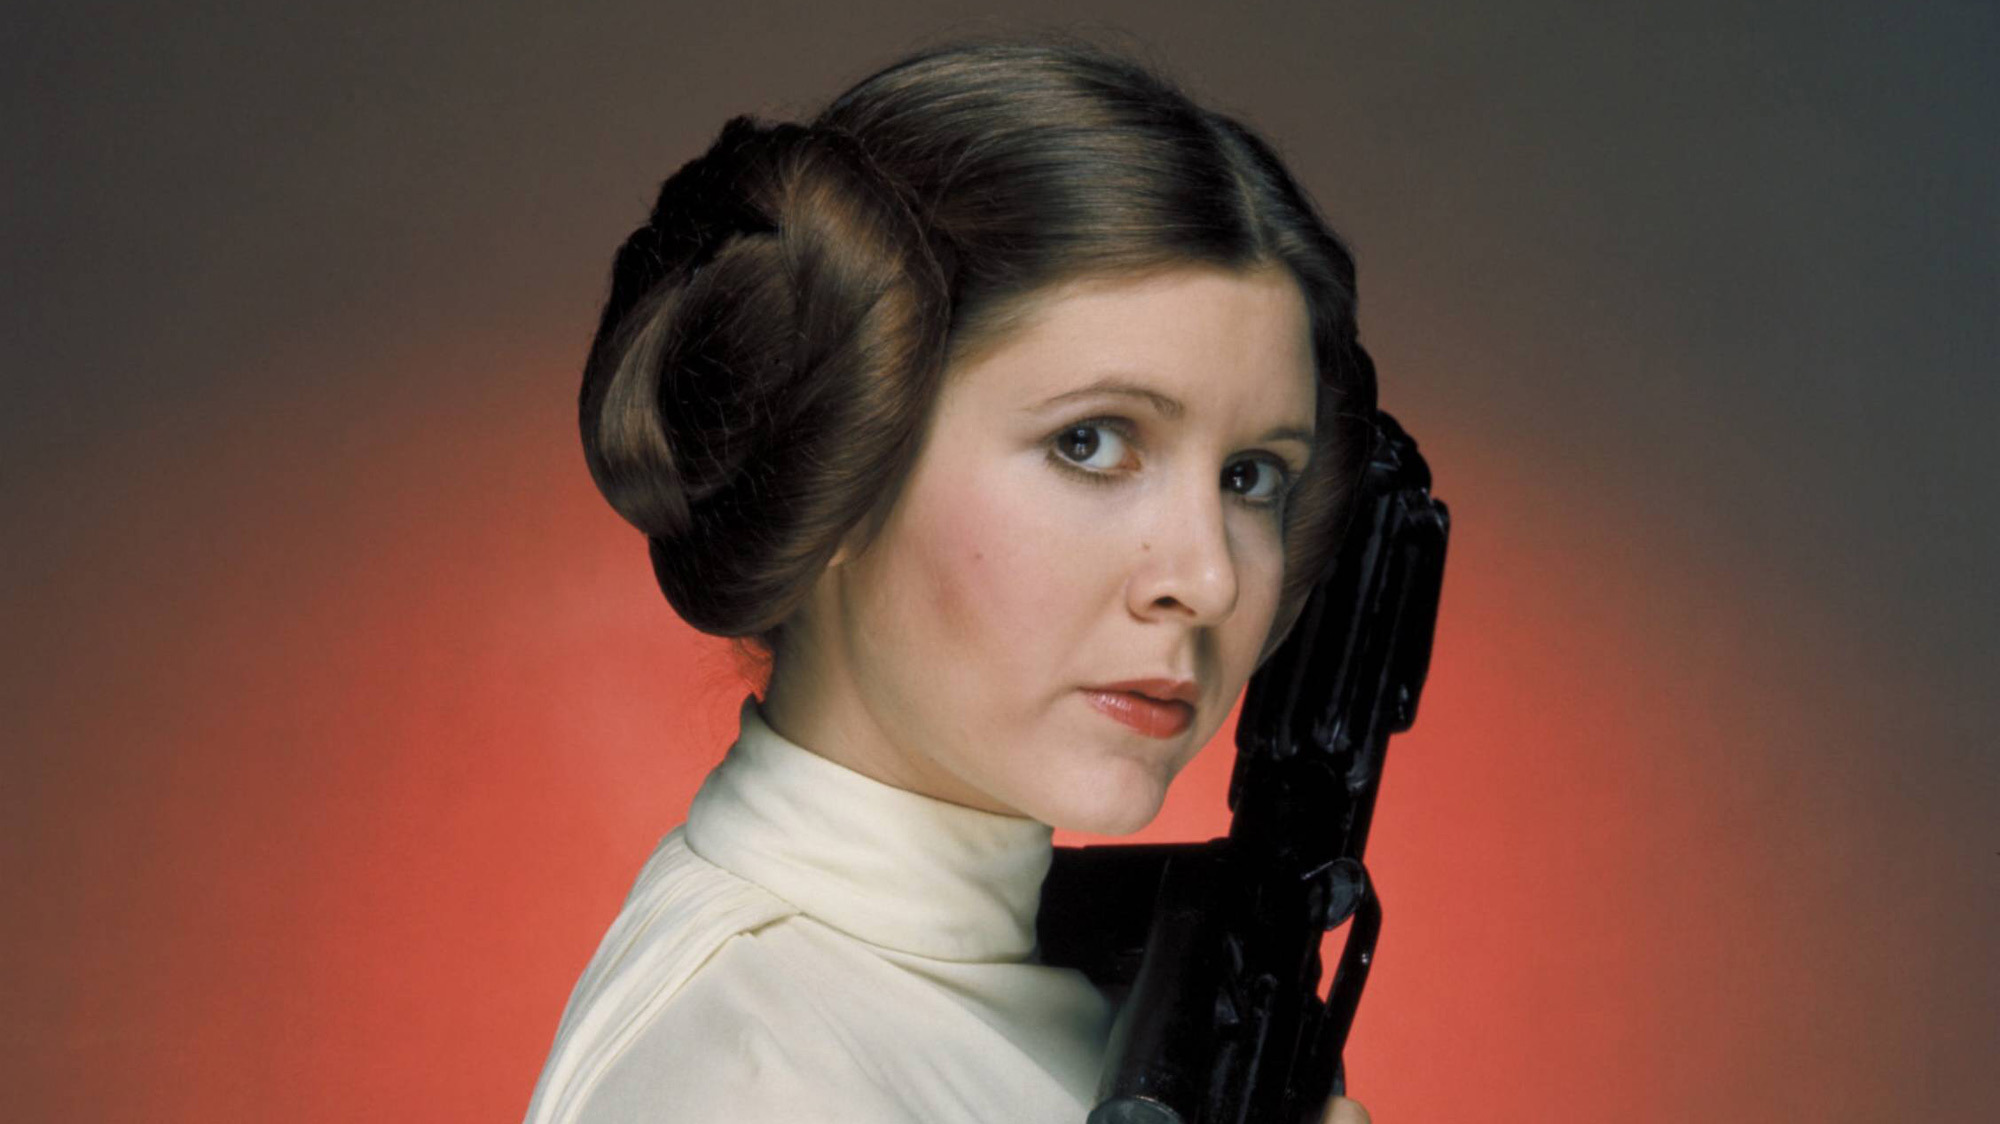 Princess Leia Wallpapers Hd